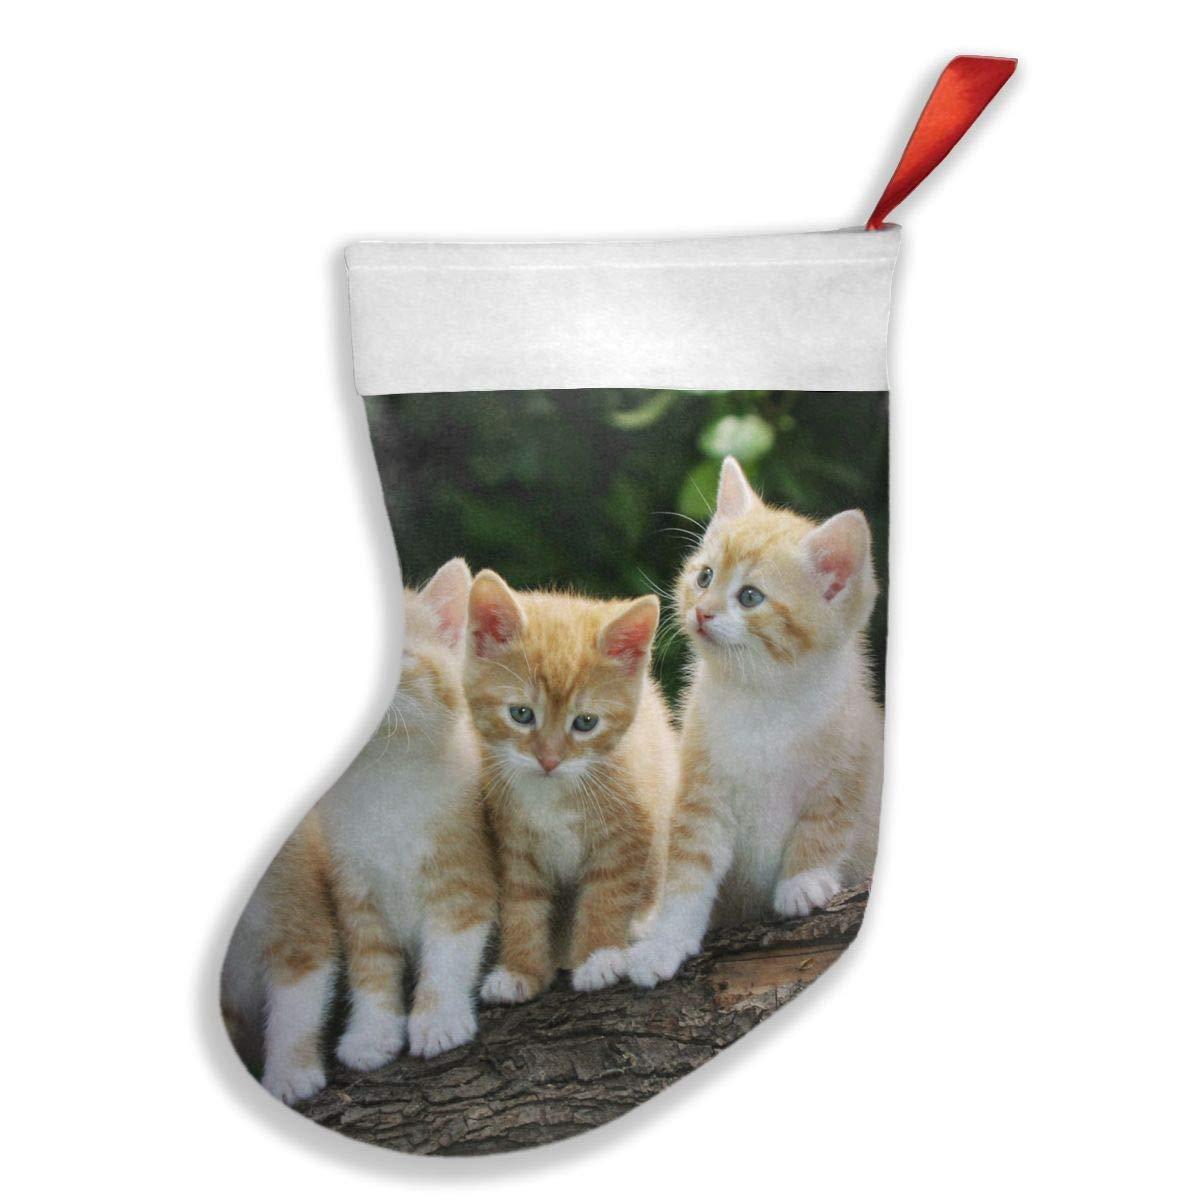 PO1 UP Cats Animal Christmas Stocking